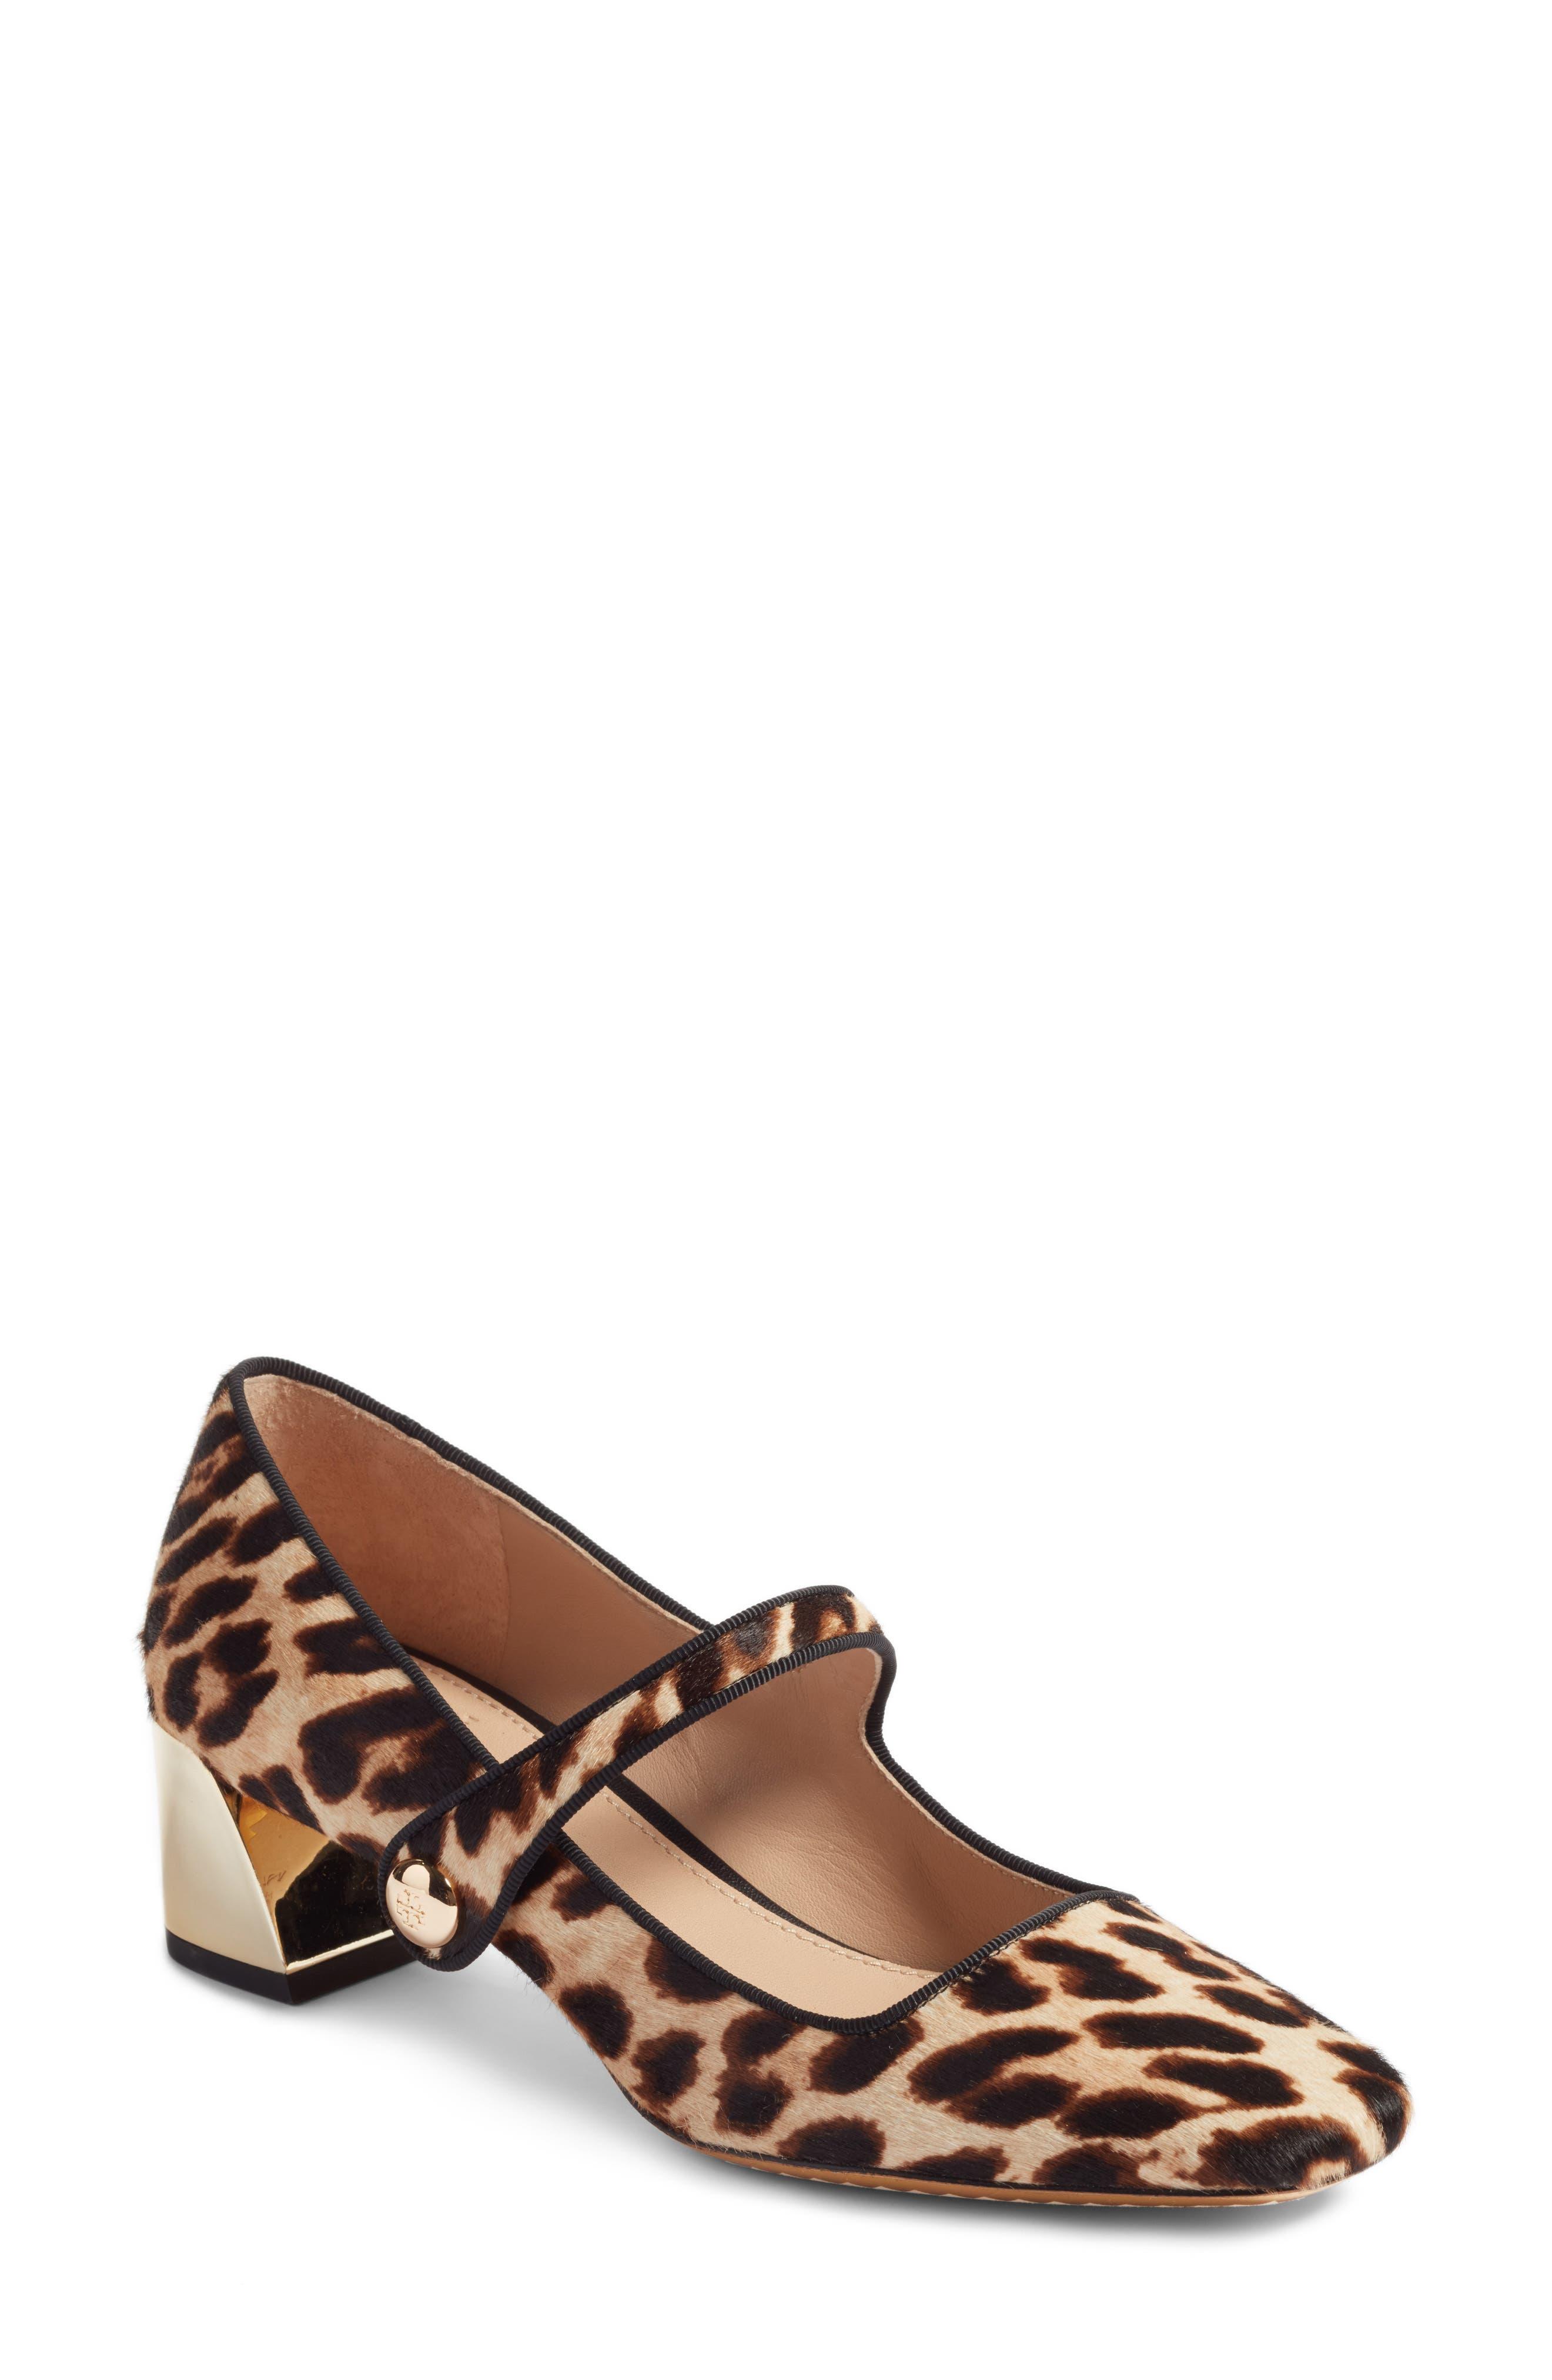 Marisa Genuine Calf Hair Mary Jane Pump,                         Main,                         color, Natural Leopard/ Black